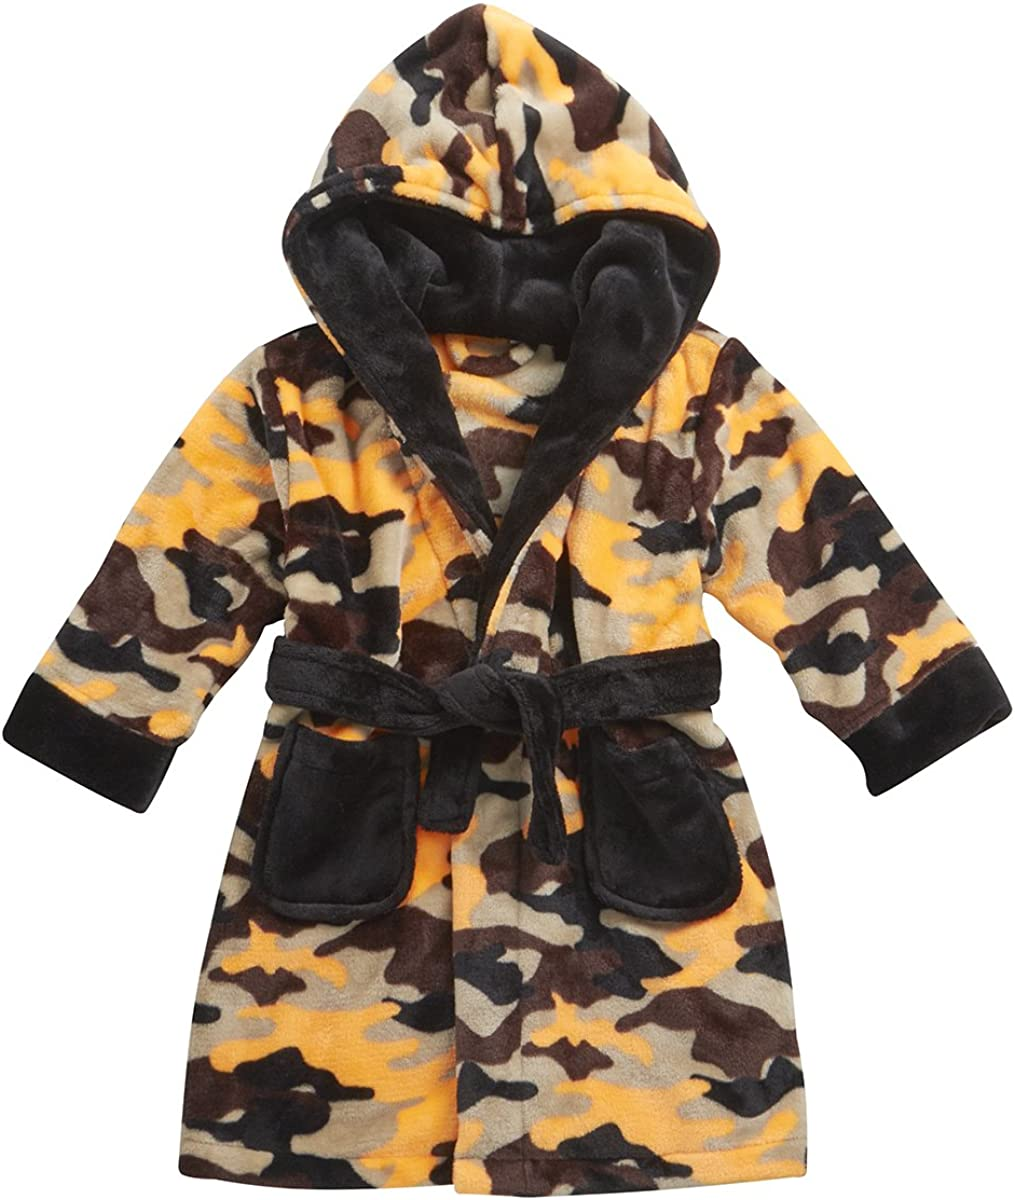 MINIKIDZ Boys Childrens Kids Velvety Soft Bath Robe Dressing Gown Camouflage New